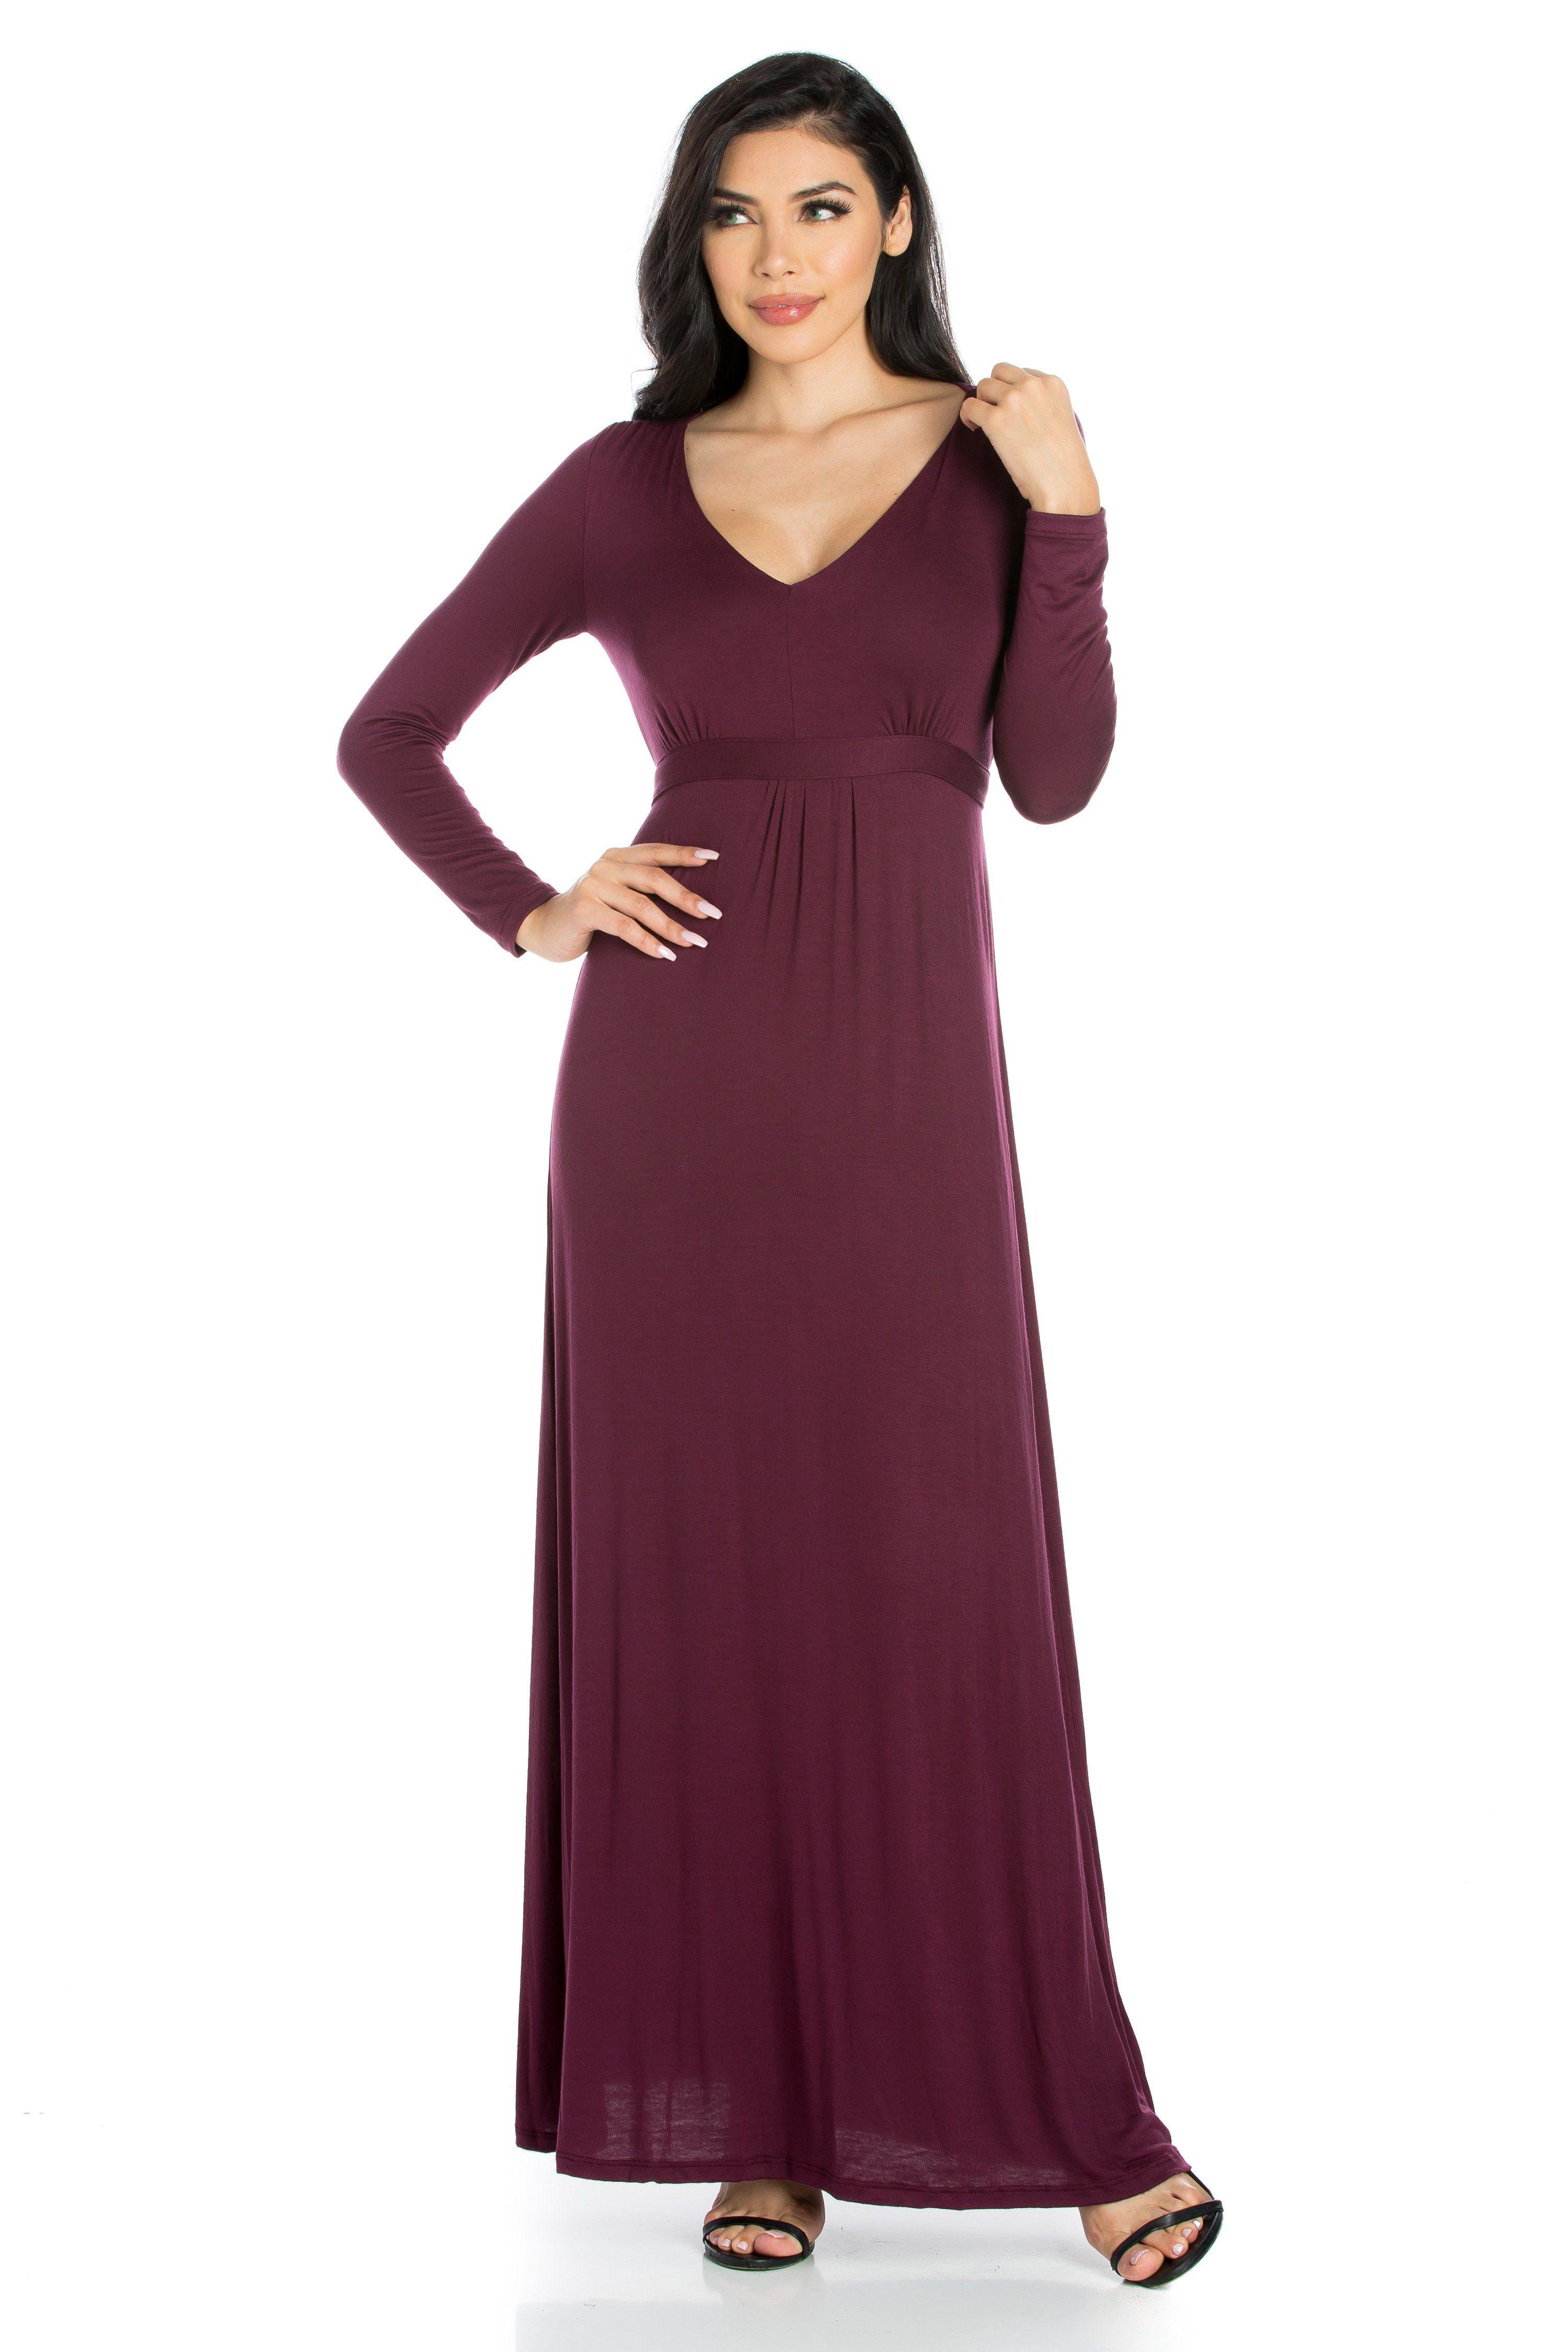 3c175e374c9 ... Dresses by 247 Comfort Apparel. Enchanting Long Sleeve V Neck Maxi  Dress Long Sleeve V Neck Maxi Dress This elegant but